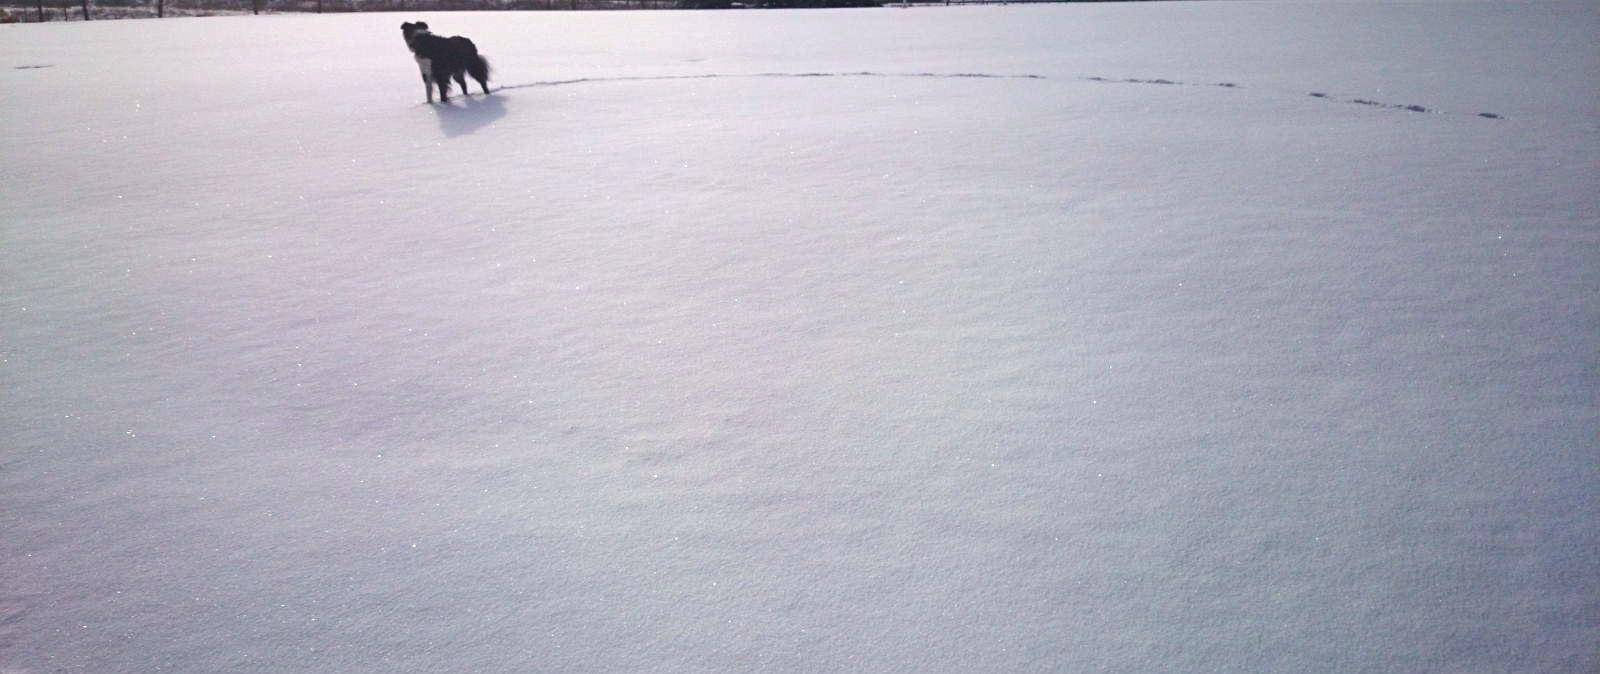 Cell January 31, 2015 Frank's Flats Fresh Snow Max 004